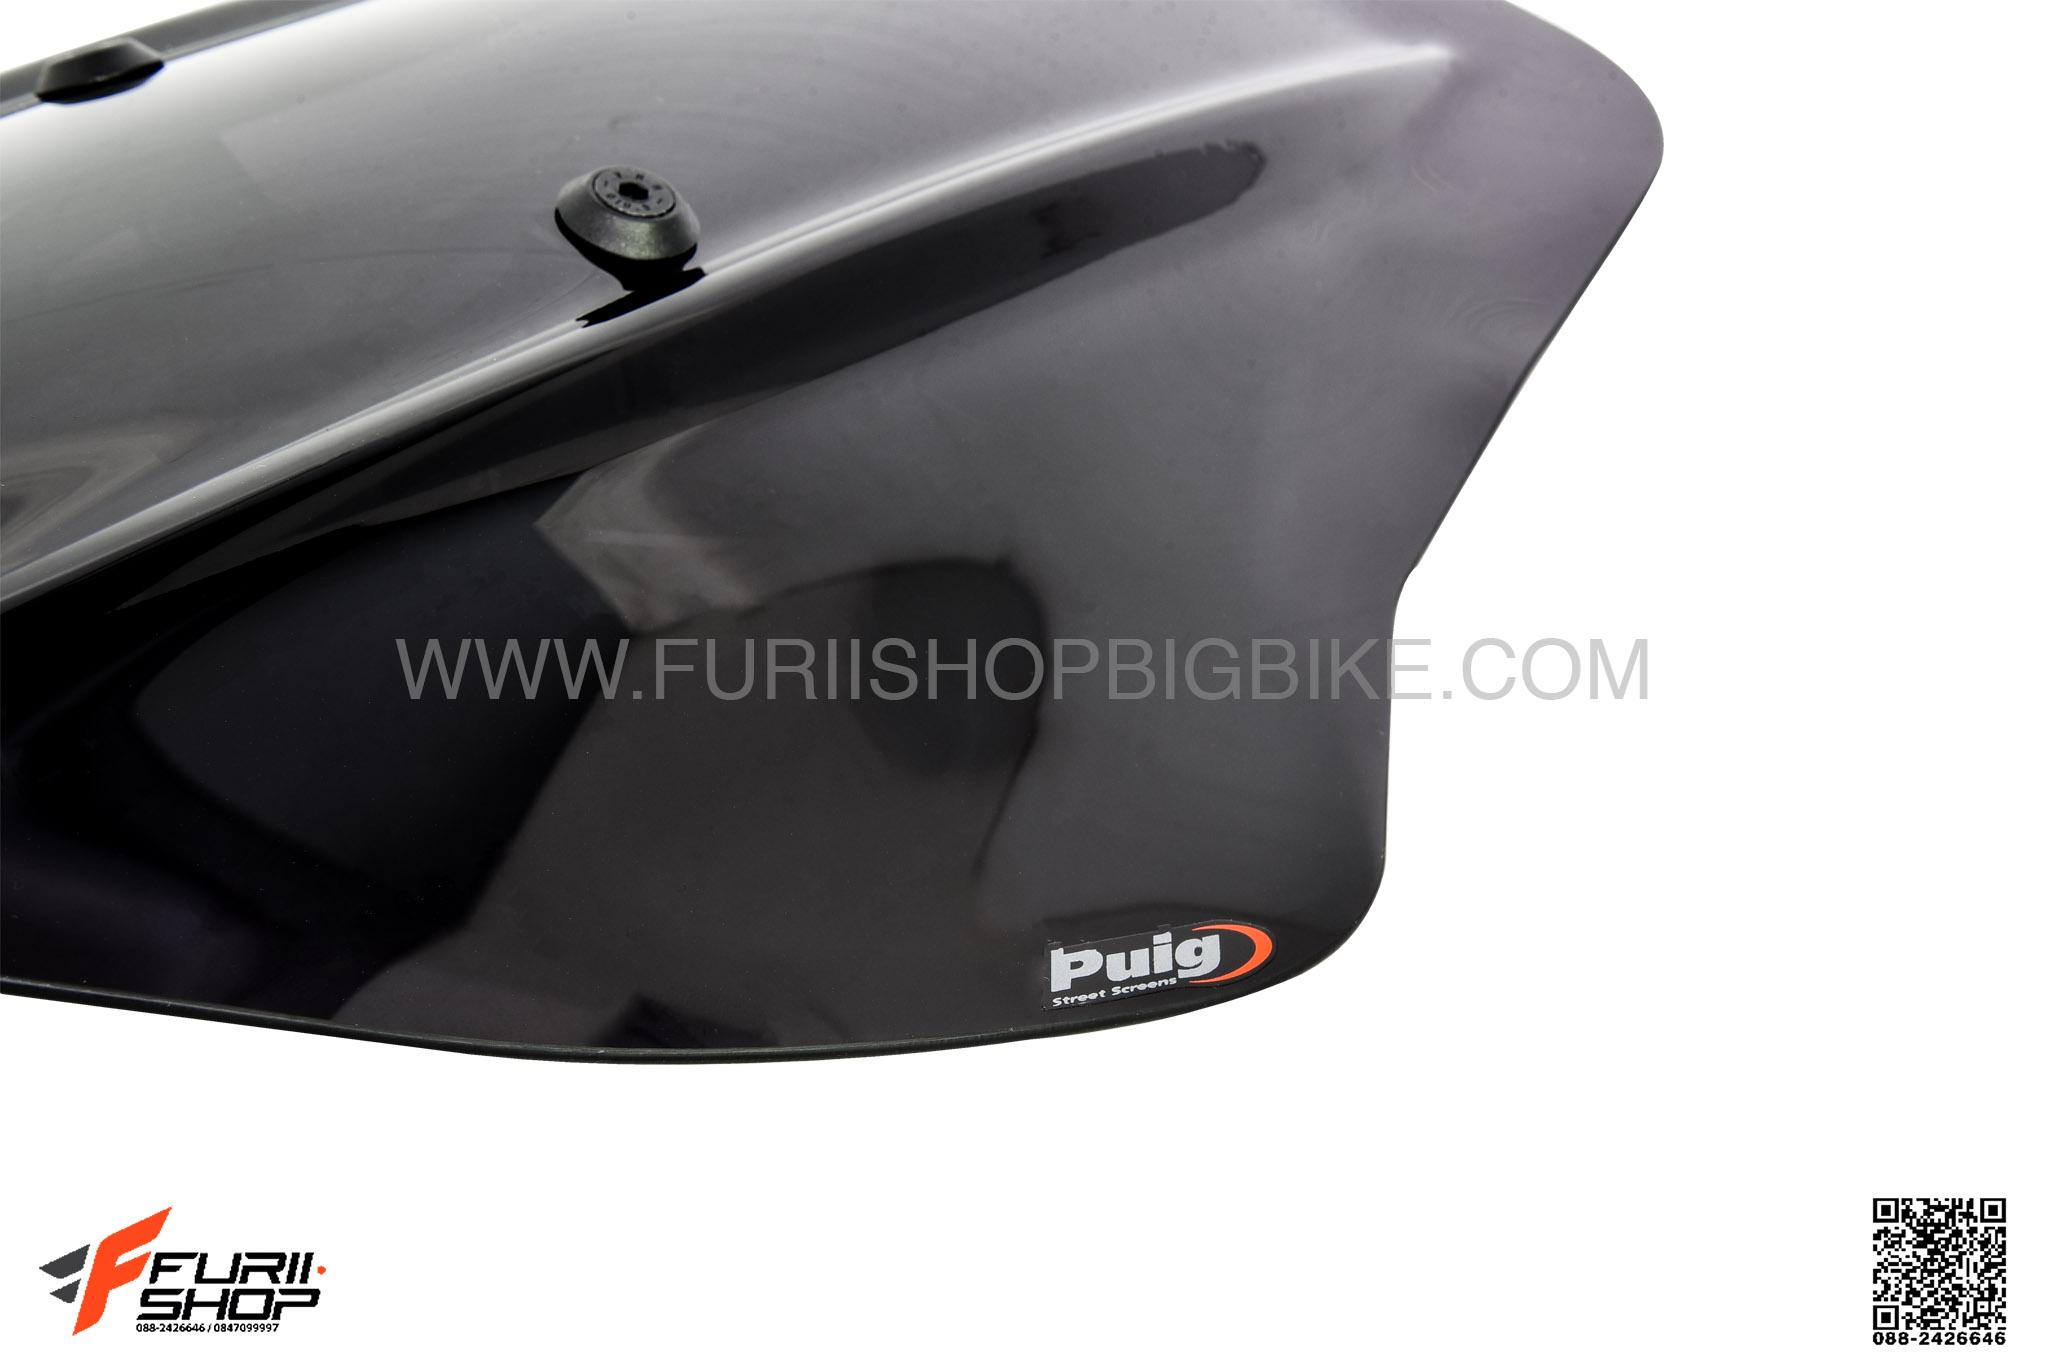 Puig Diavel 14-15 ชิว race-touring ตรงรุ่นสำหรับ Ducati Diavel